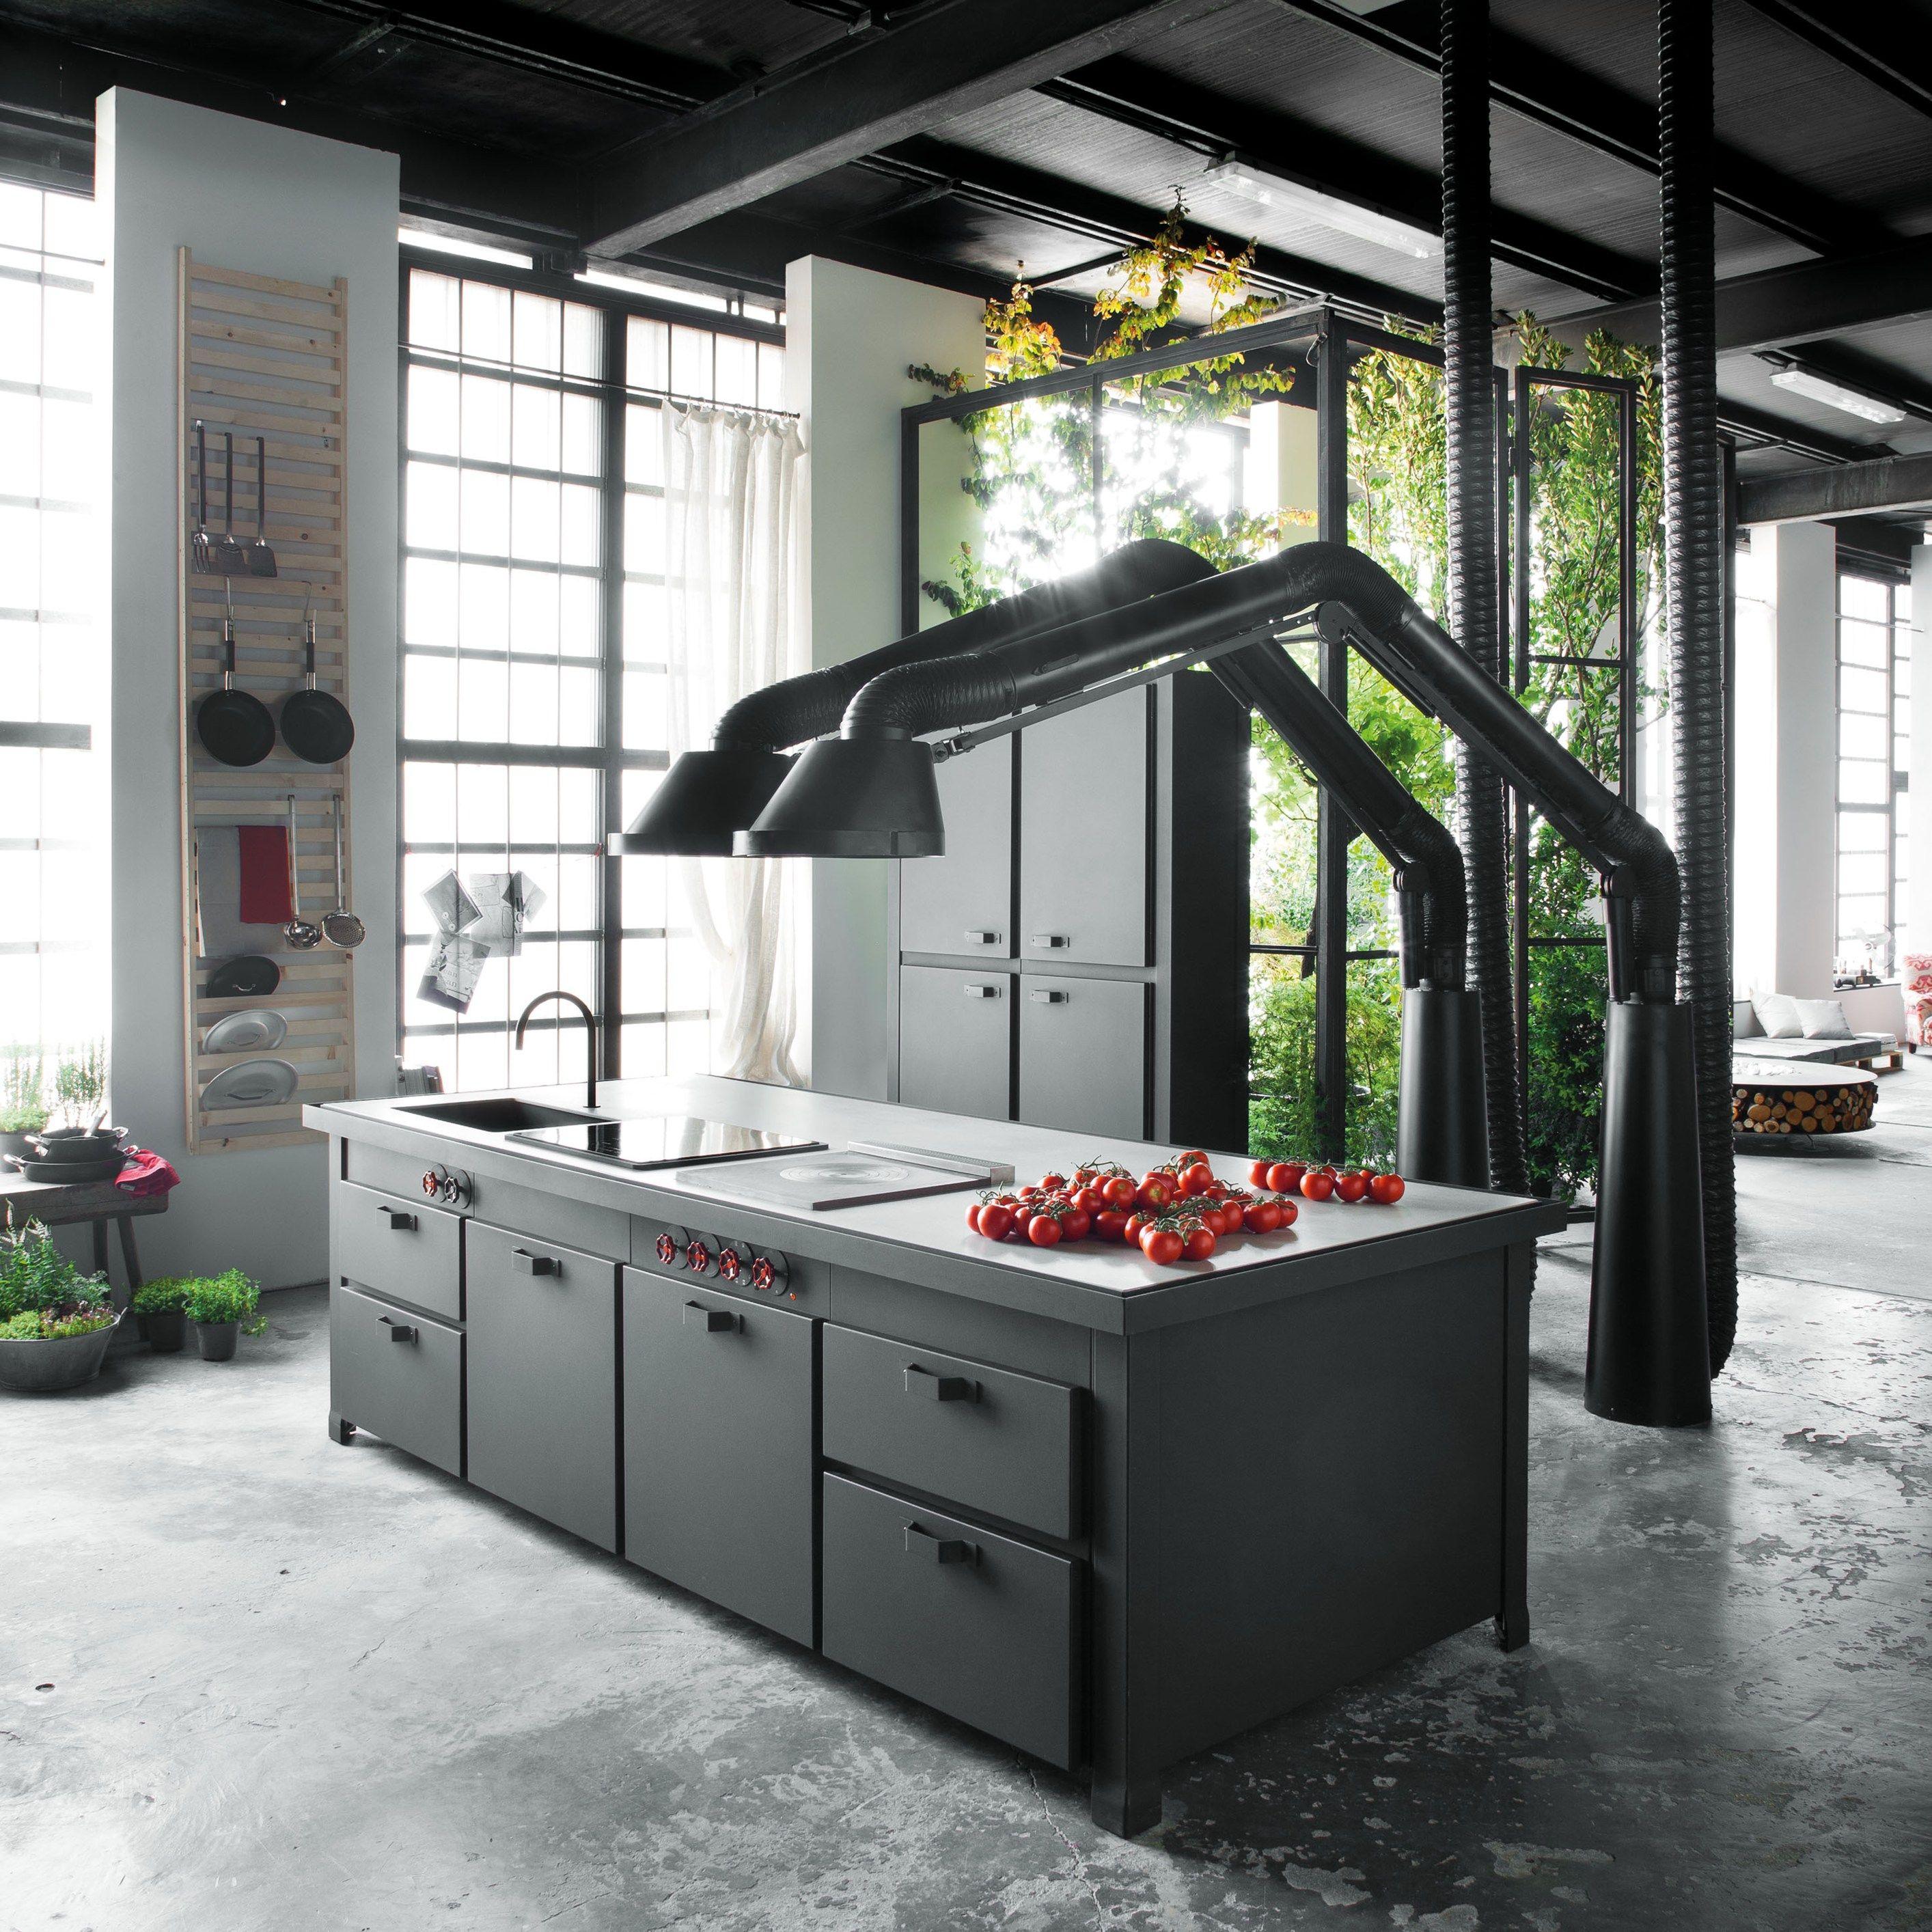 Industrial kitchen hood design - Industrial Kitchen Hood Design